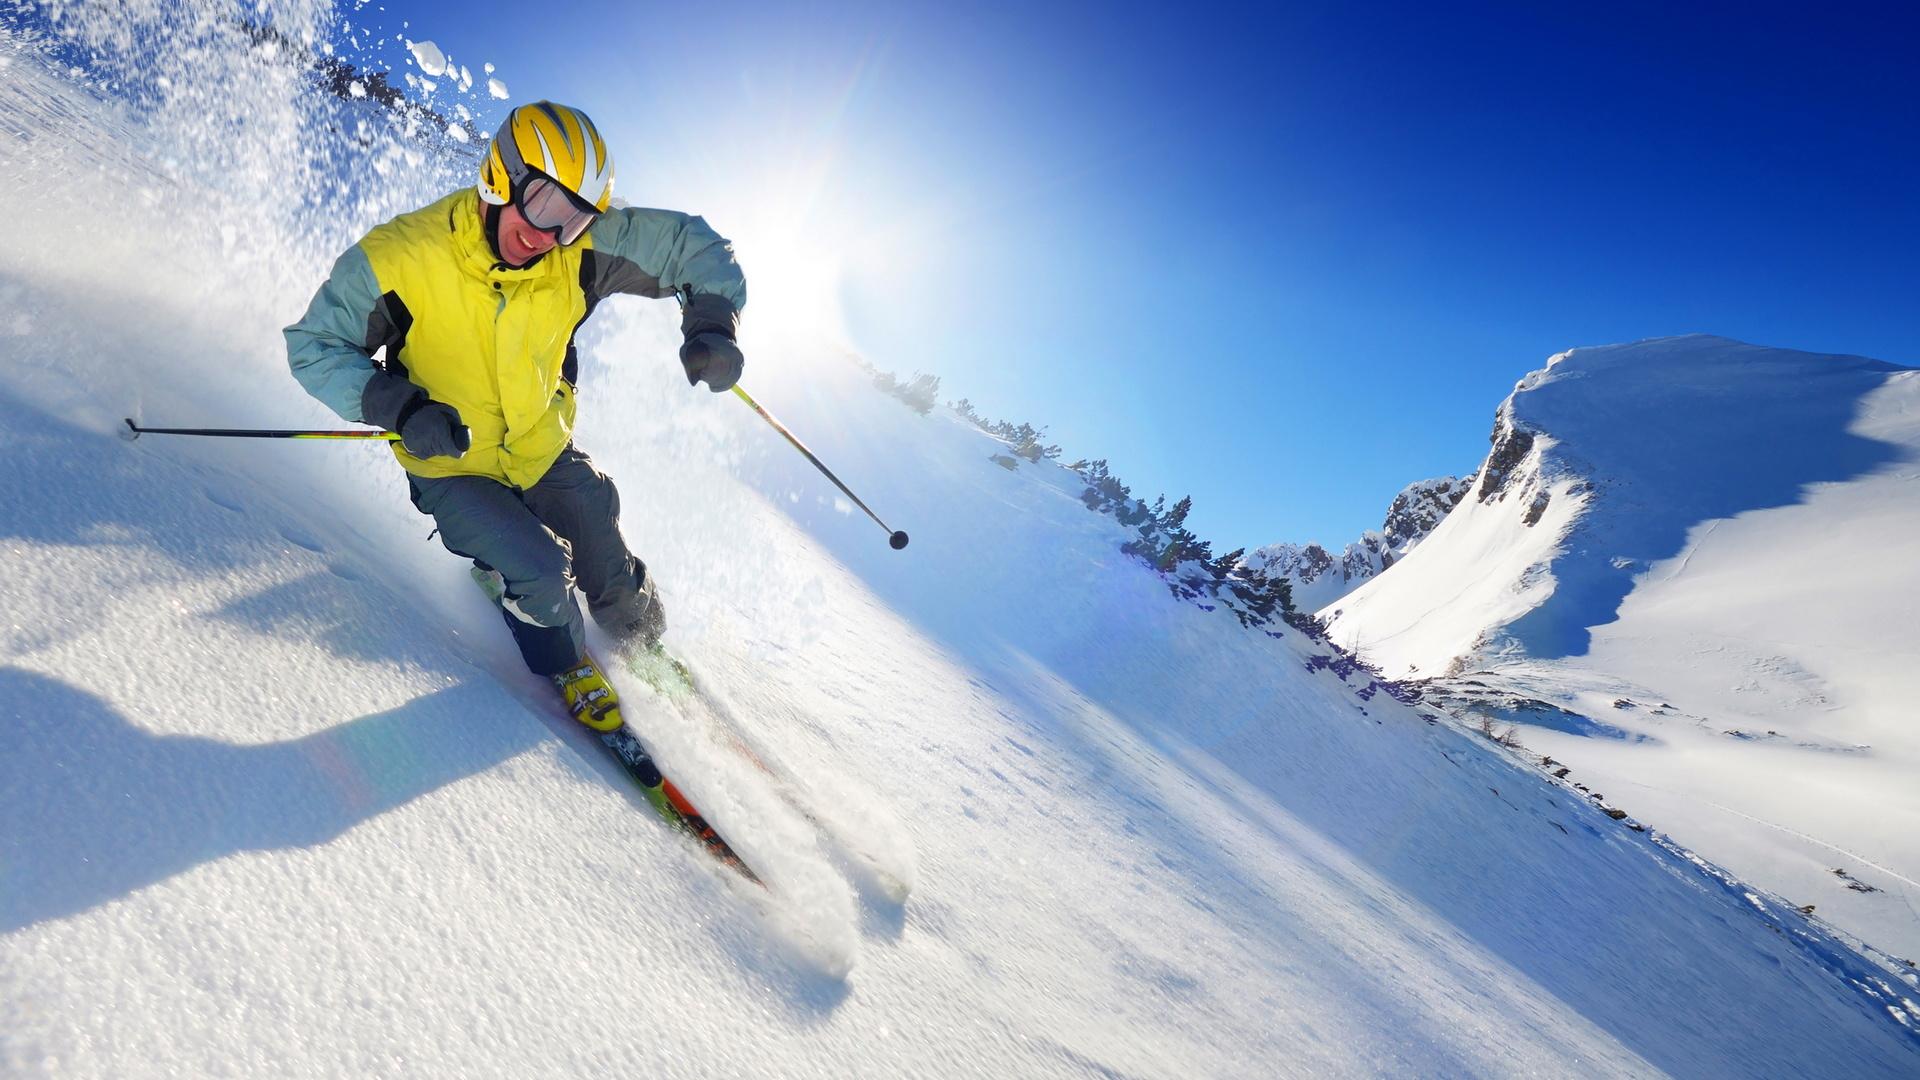 Skiing Sport Wallpaper Iphone: Winter Sports Wallpapers